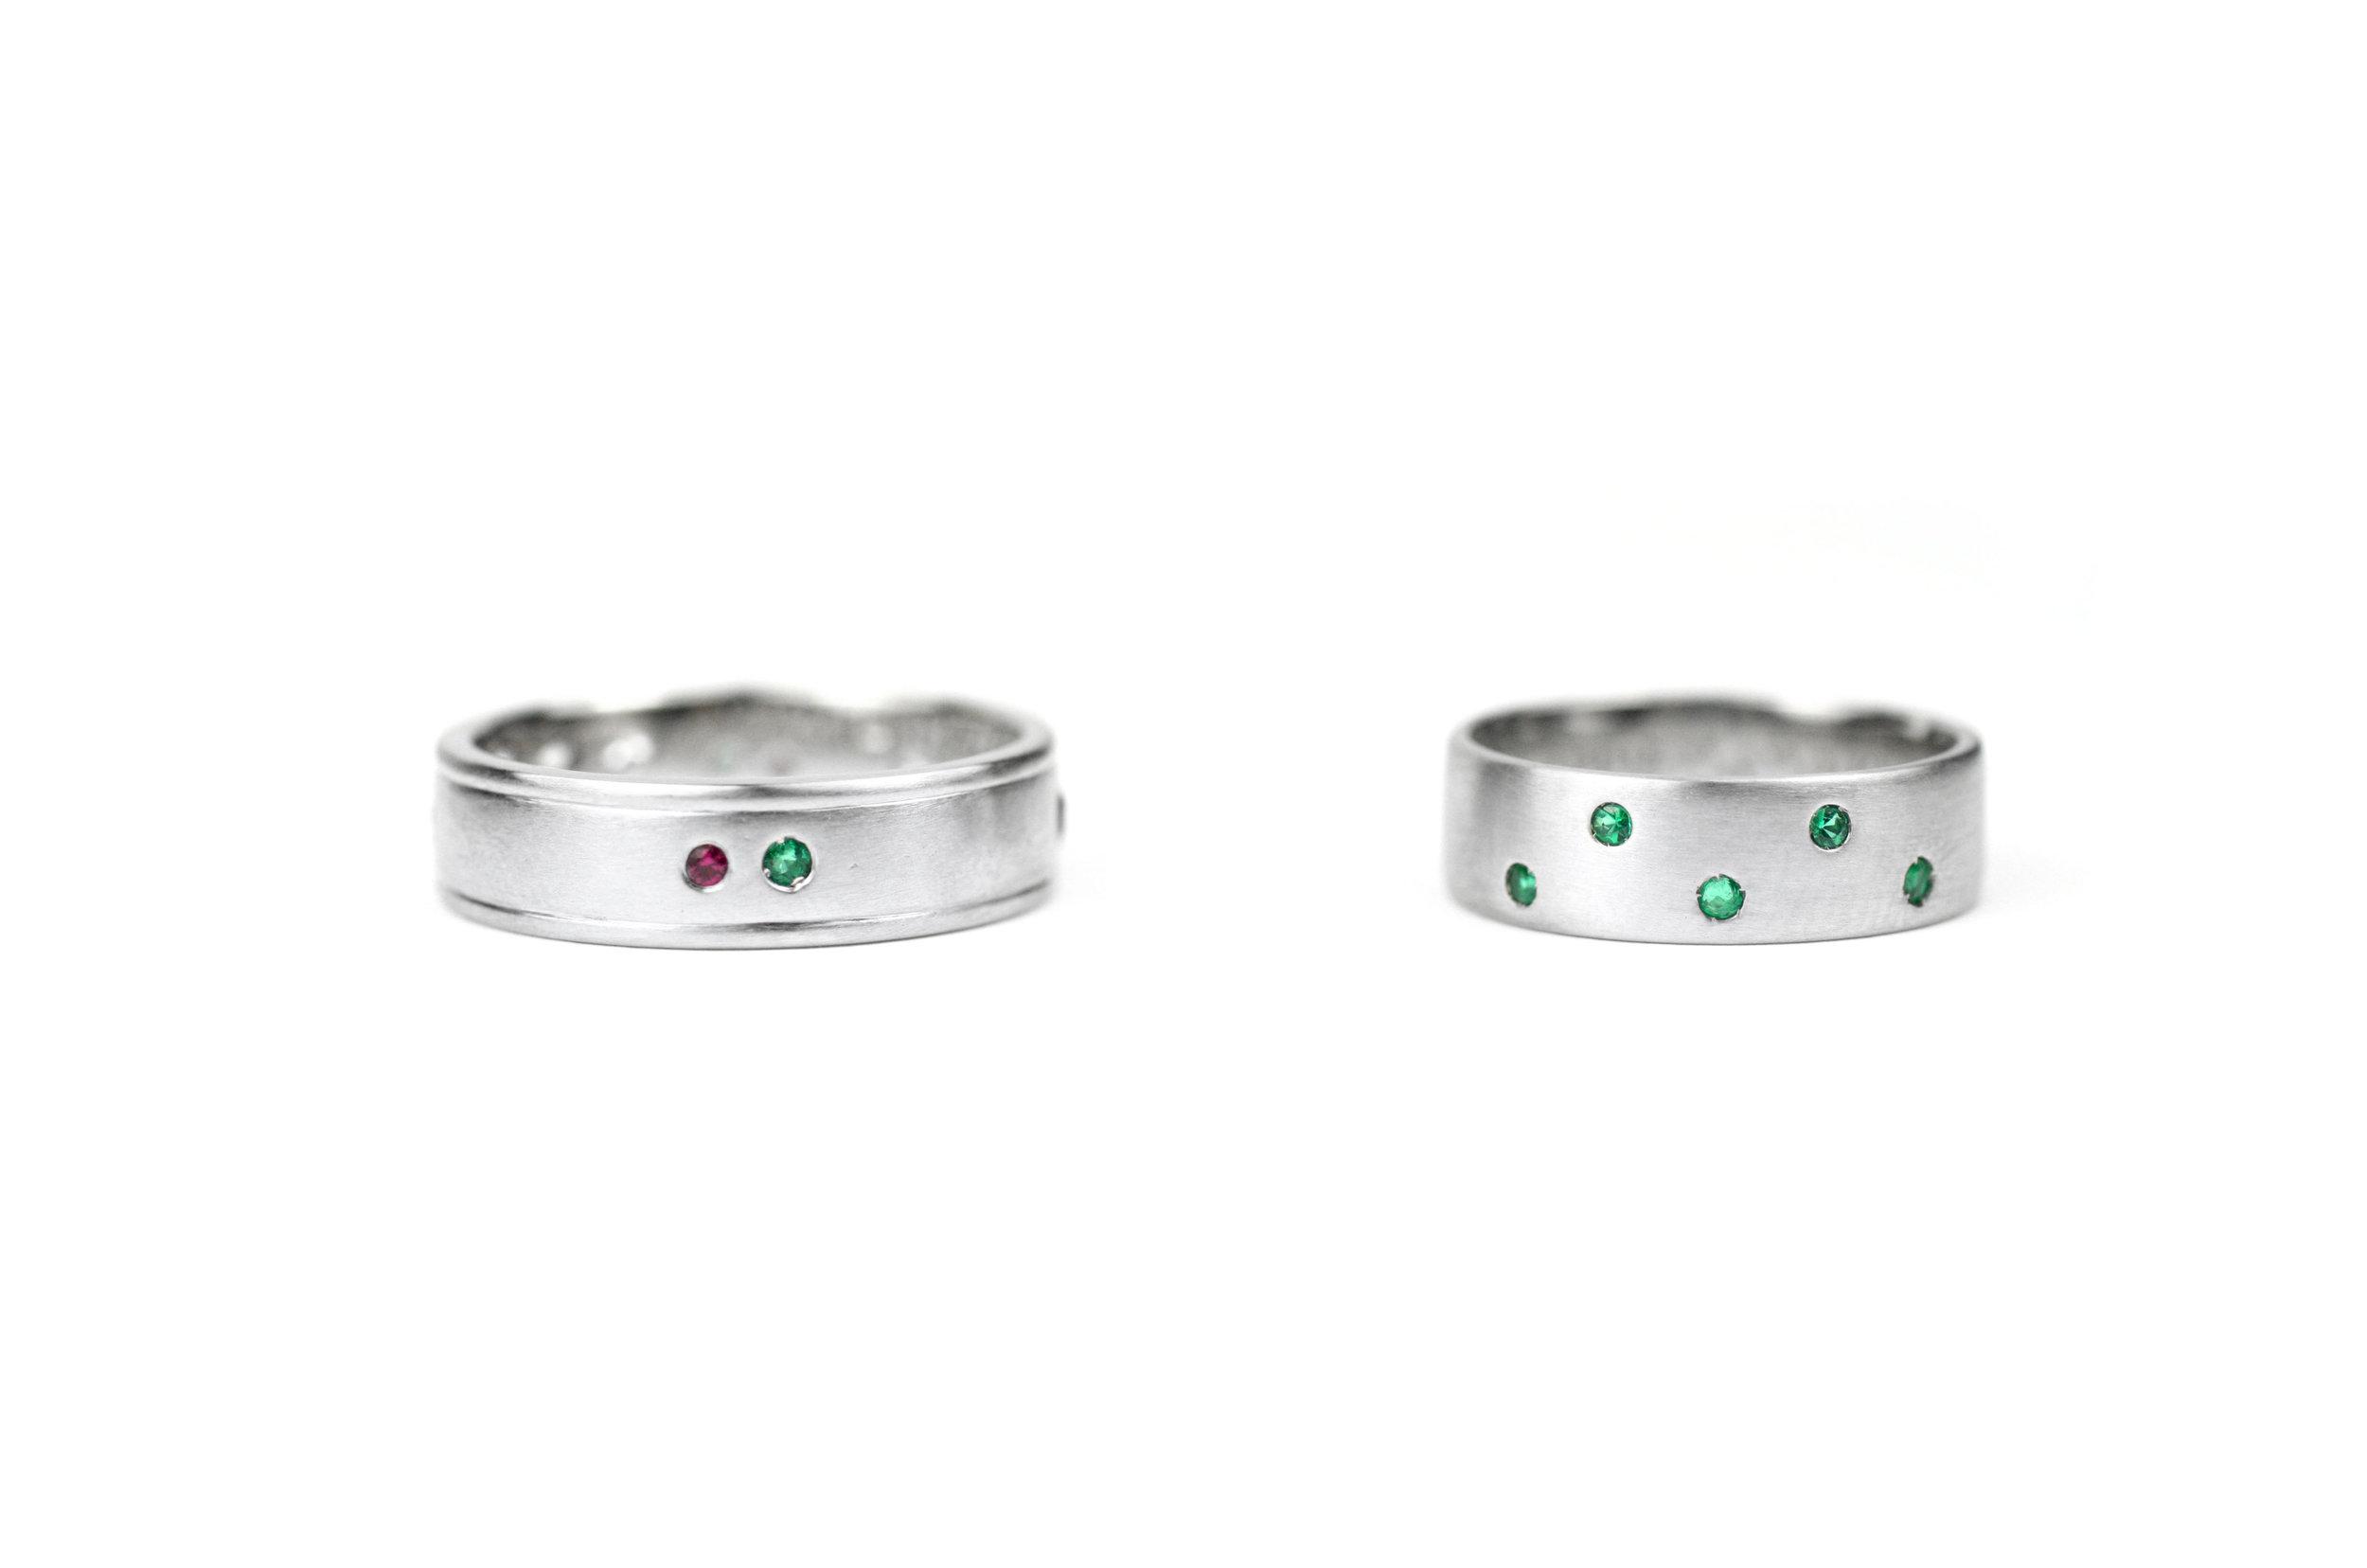 Platinum and Emerald Bands